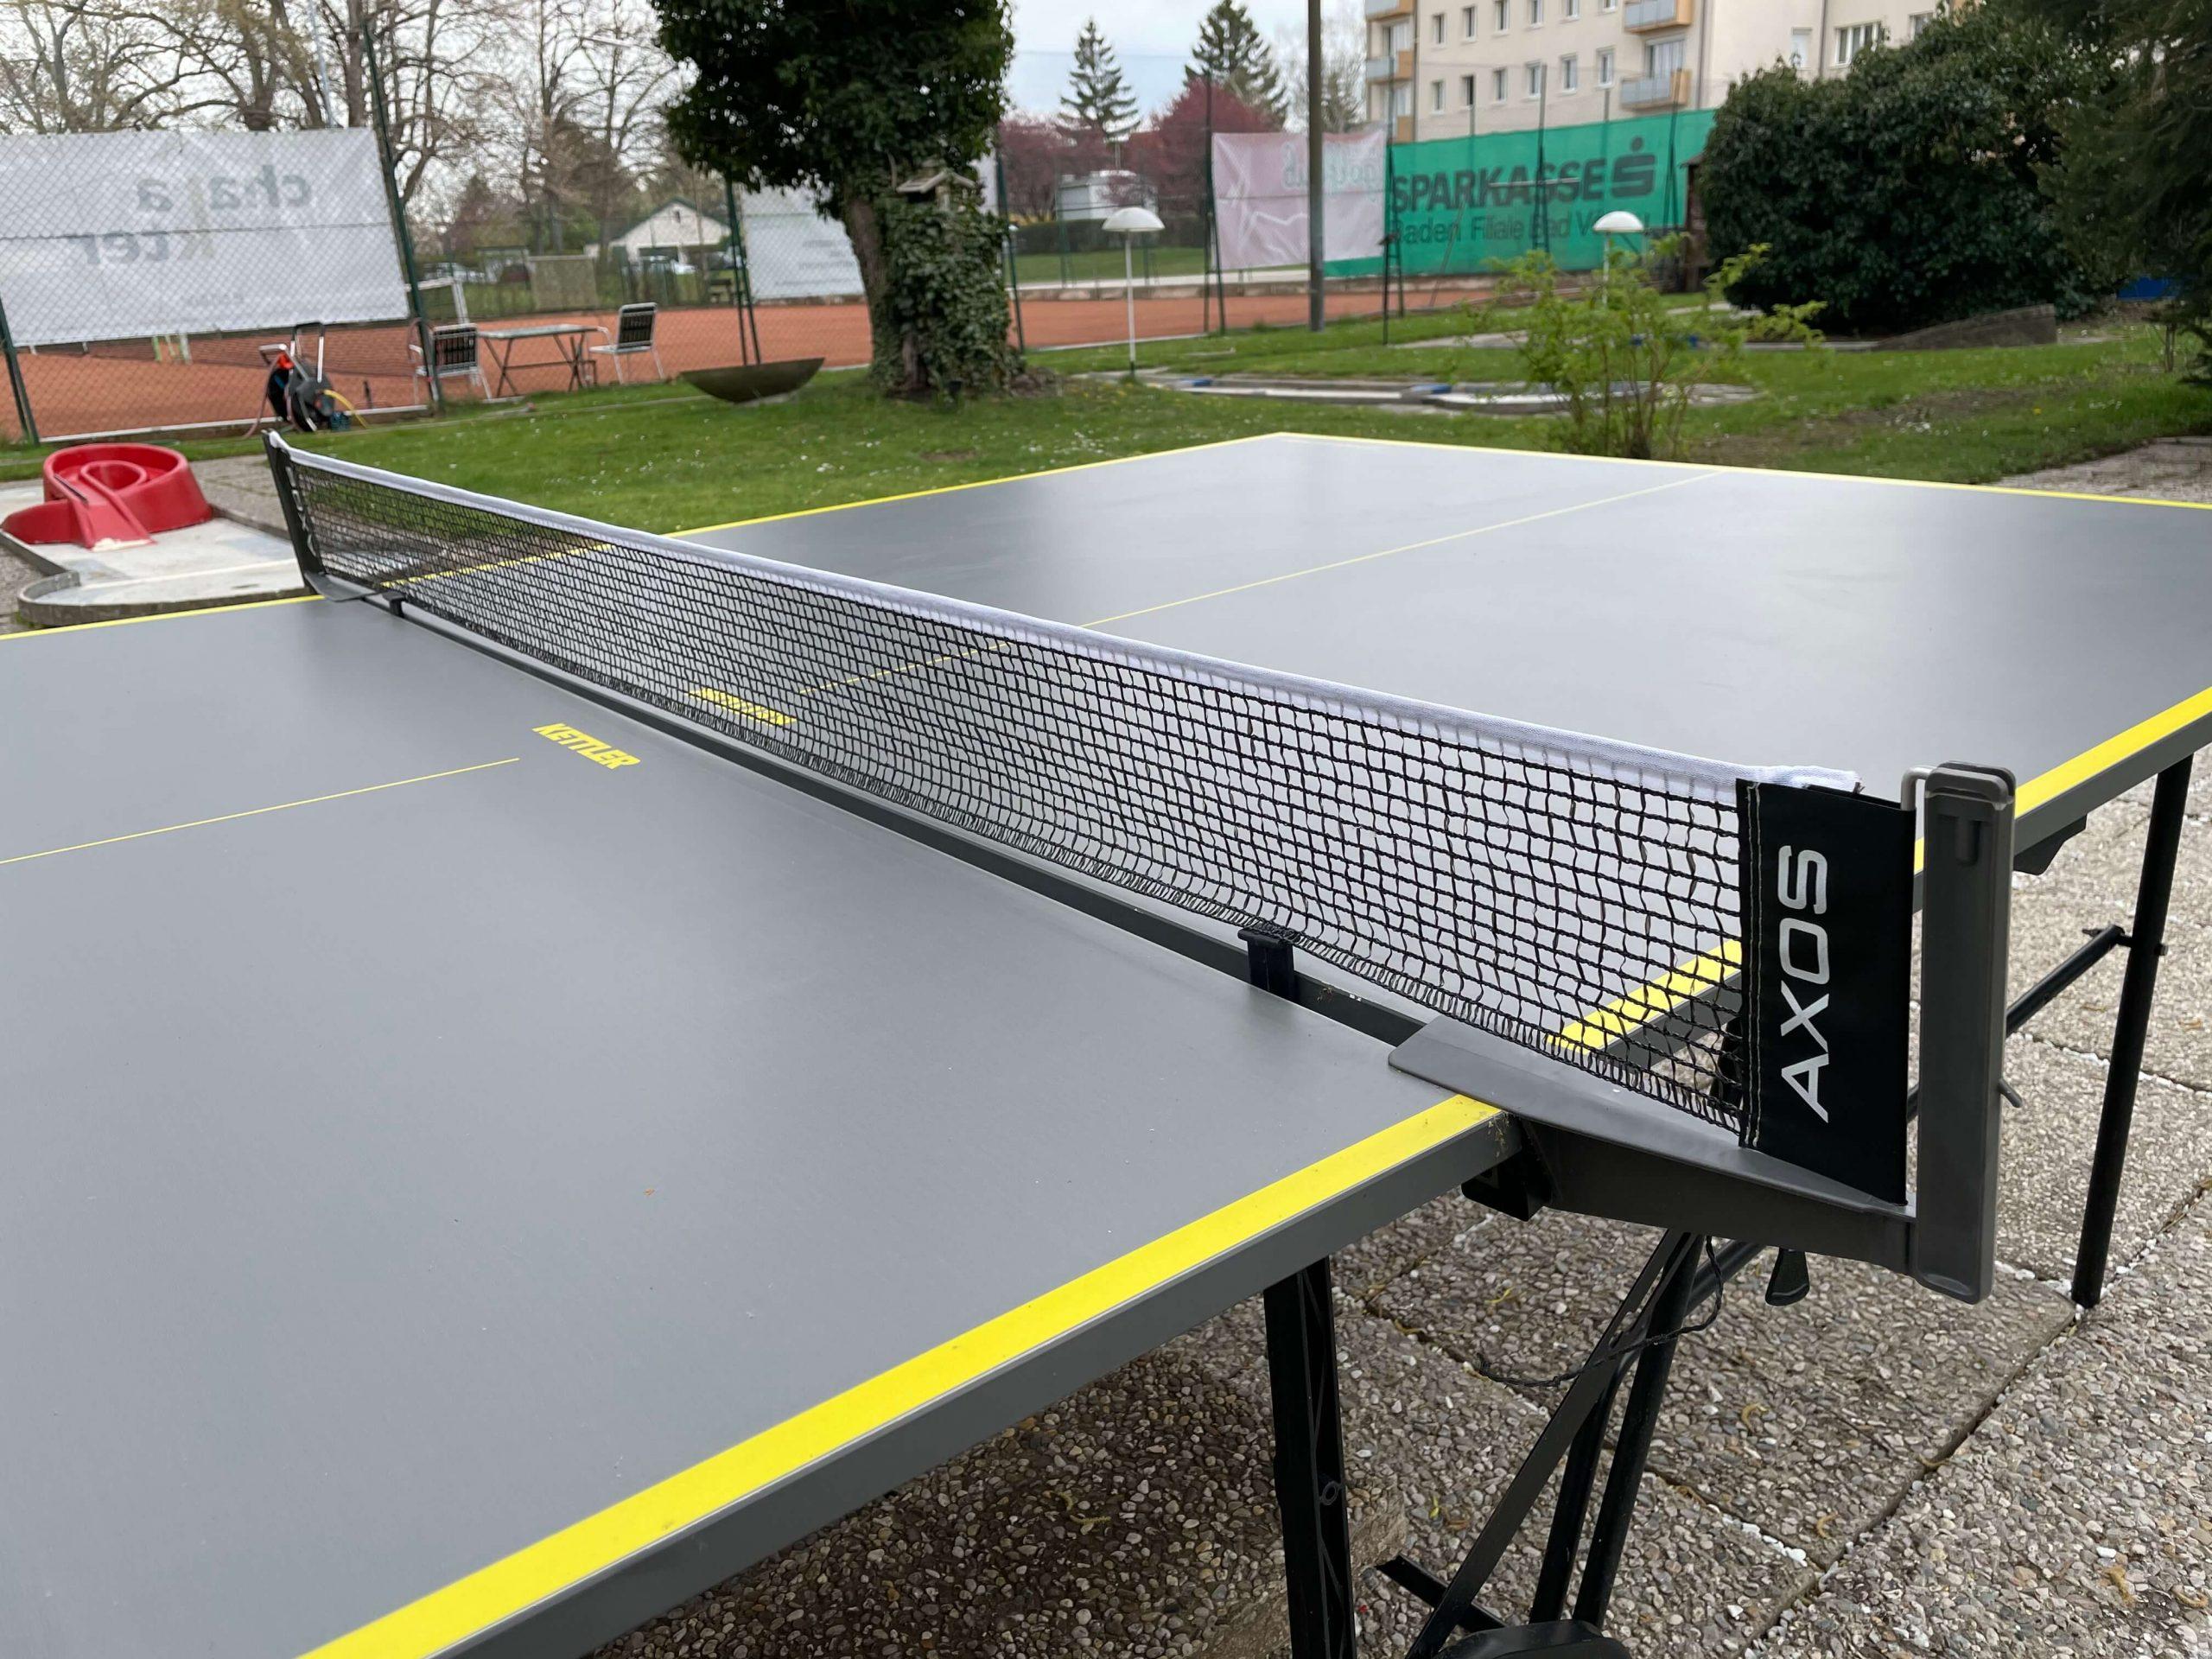 Chris-Corner-Tischtennis-2